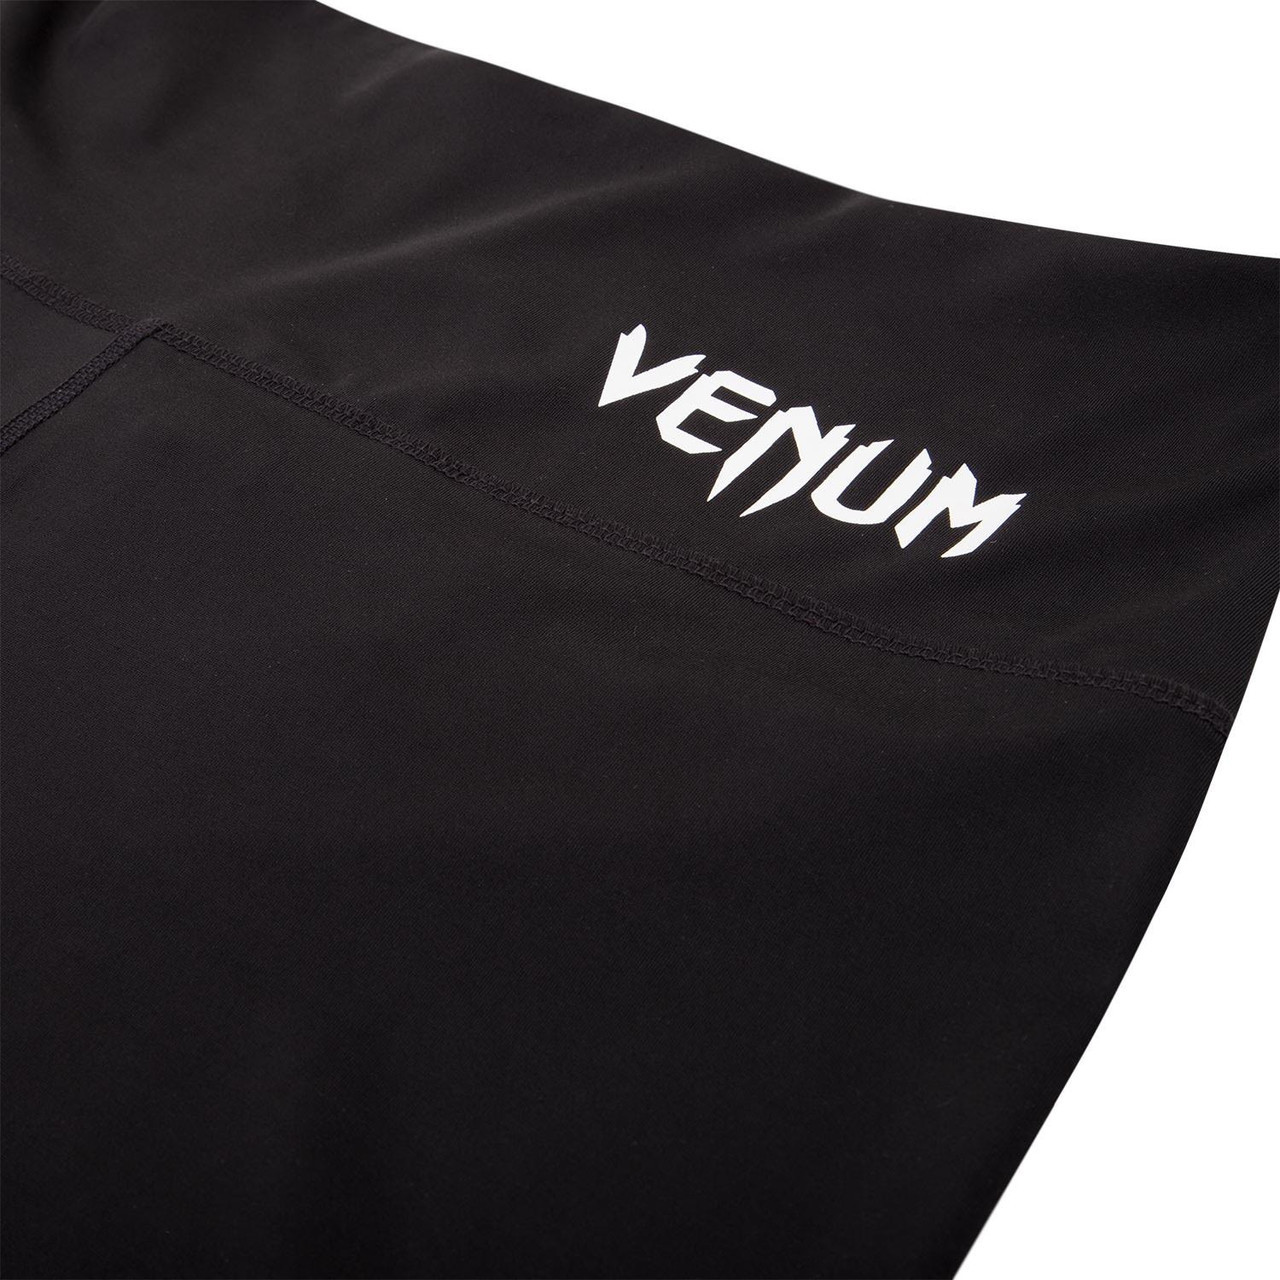 Venum Essential Leggings now available at www.thejiujitsushop.com  Enjoy Free Shipping from The Jiu Jitsu Shop today!